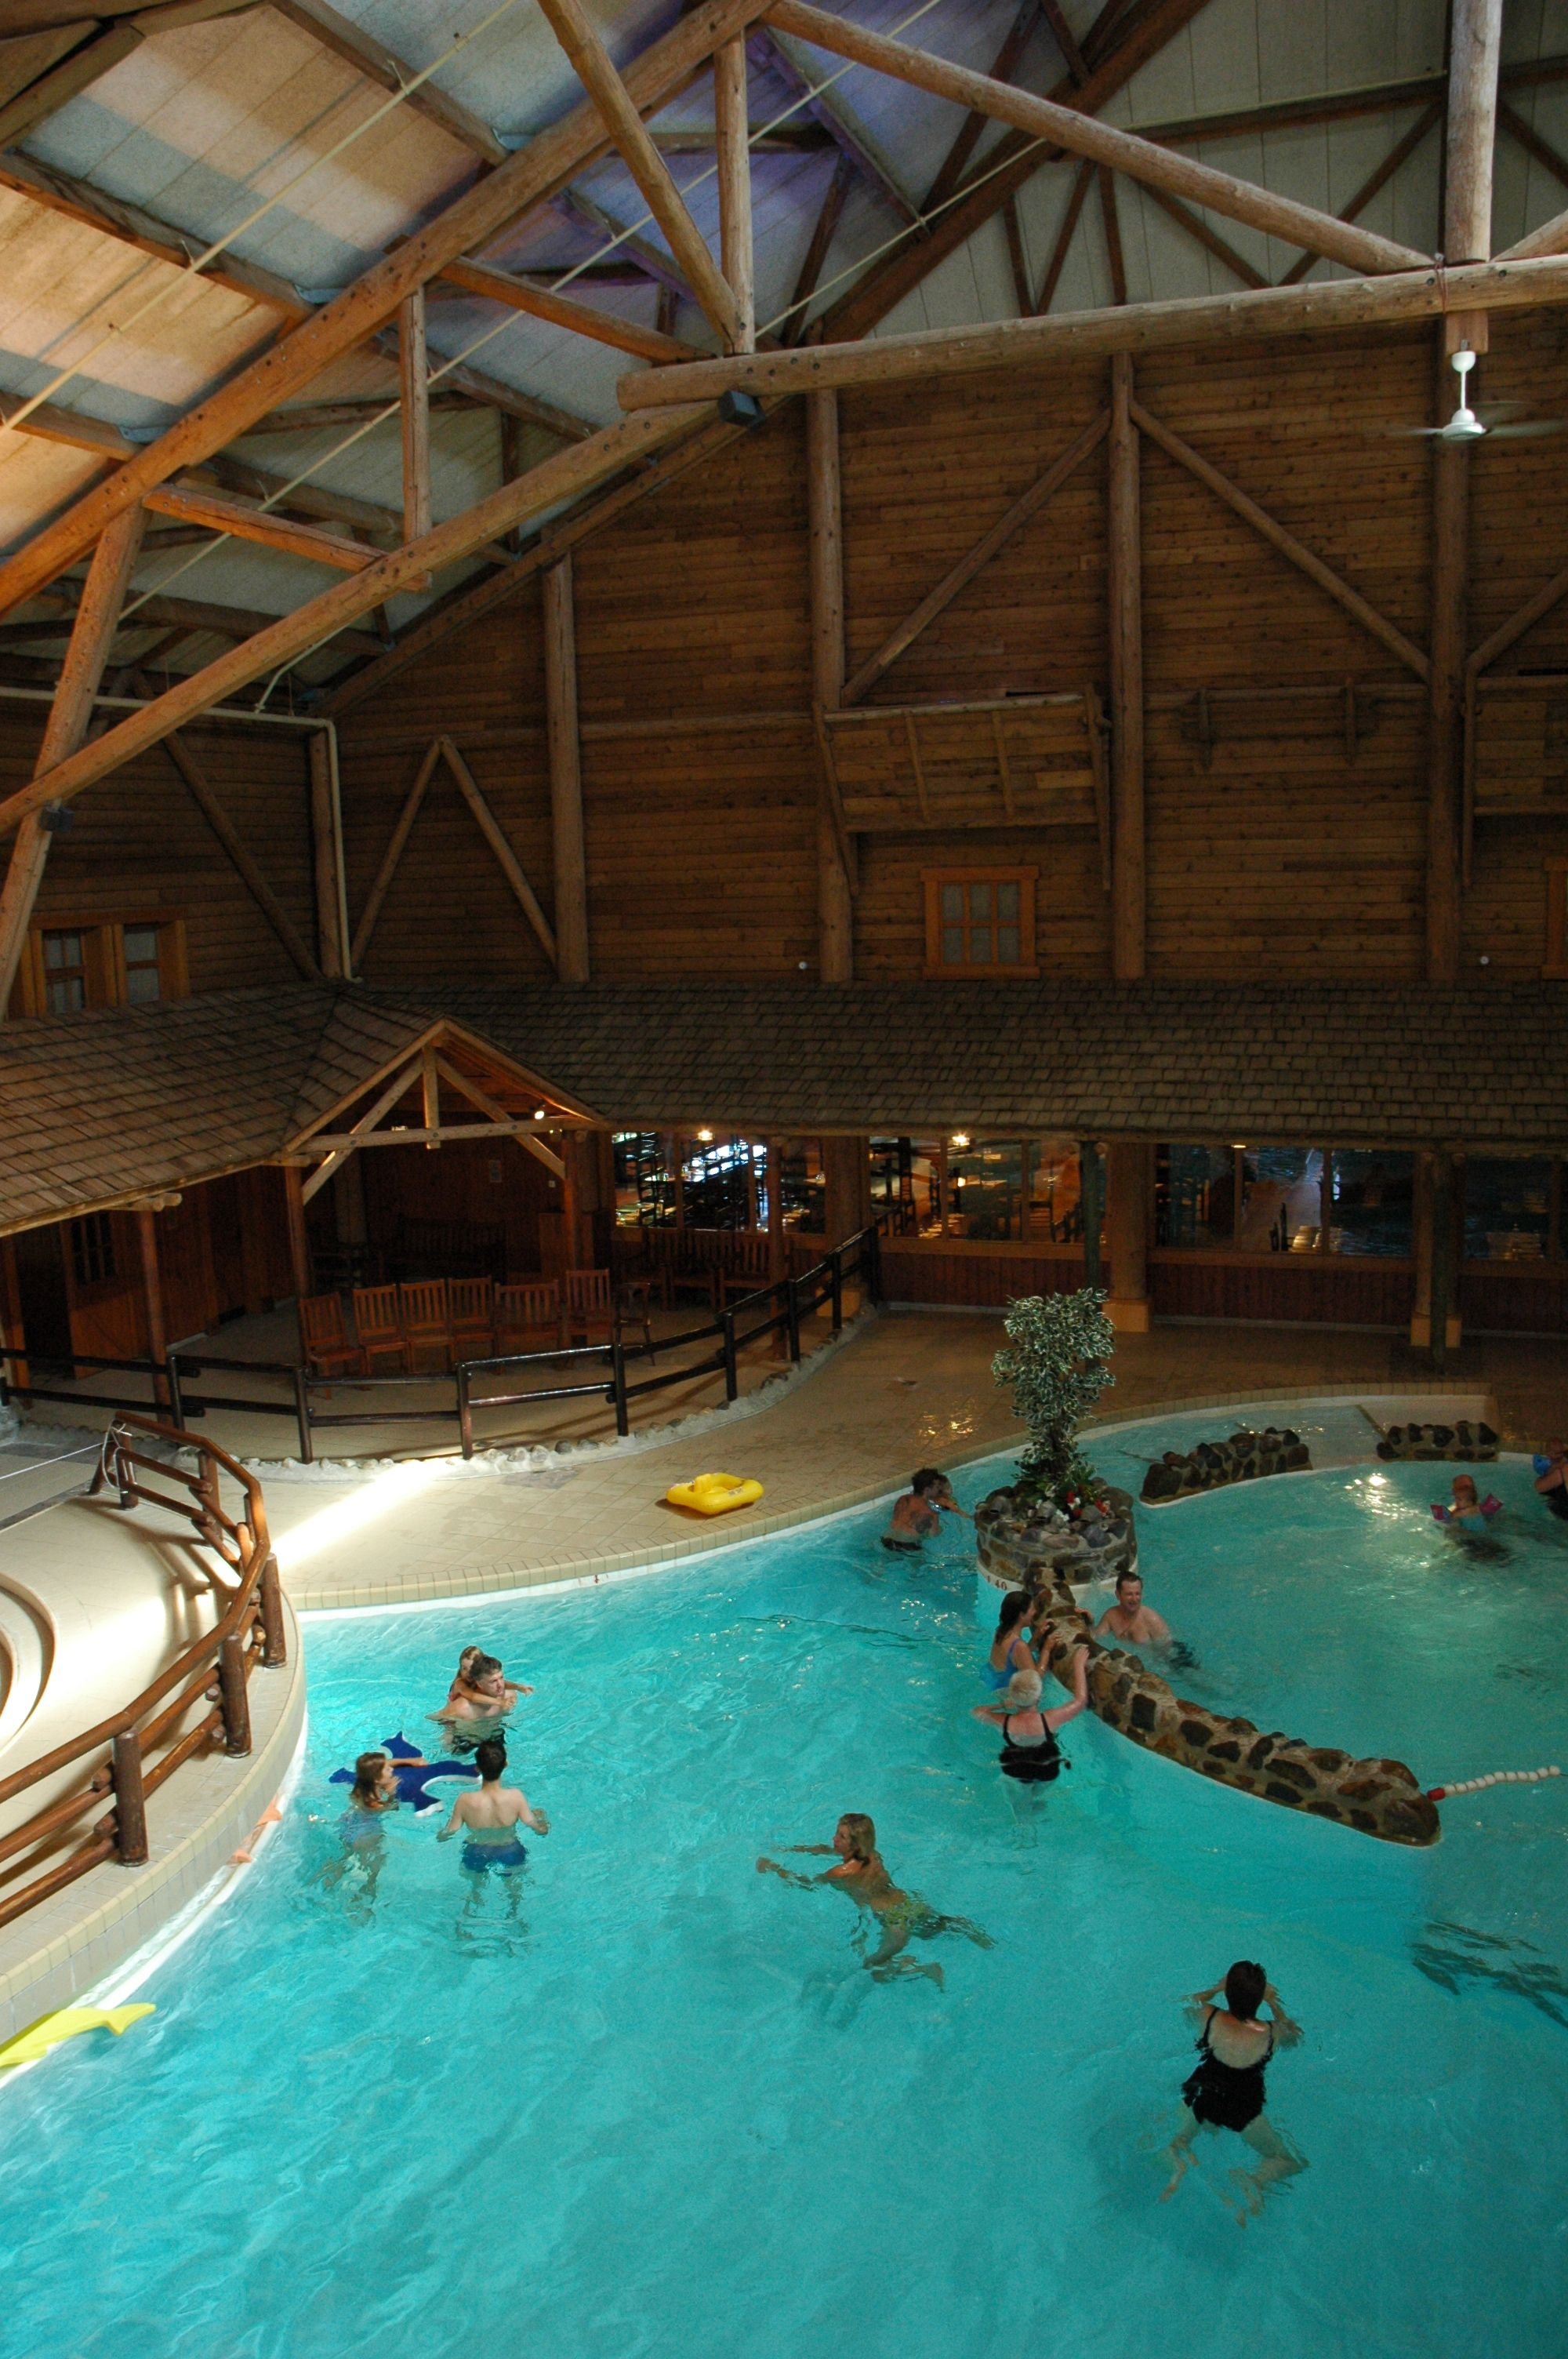 Disney Hotels Davy Crockett Ranch Indoor Pool Disneyland Paris